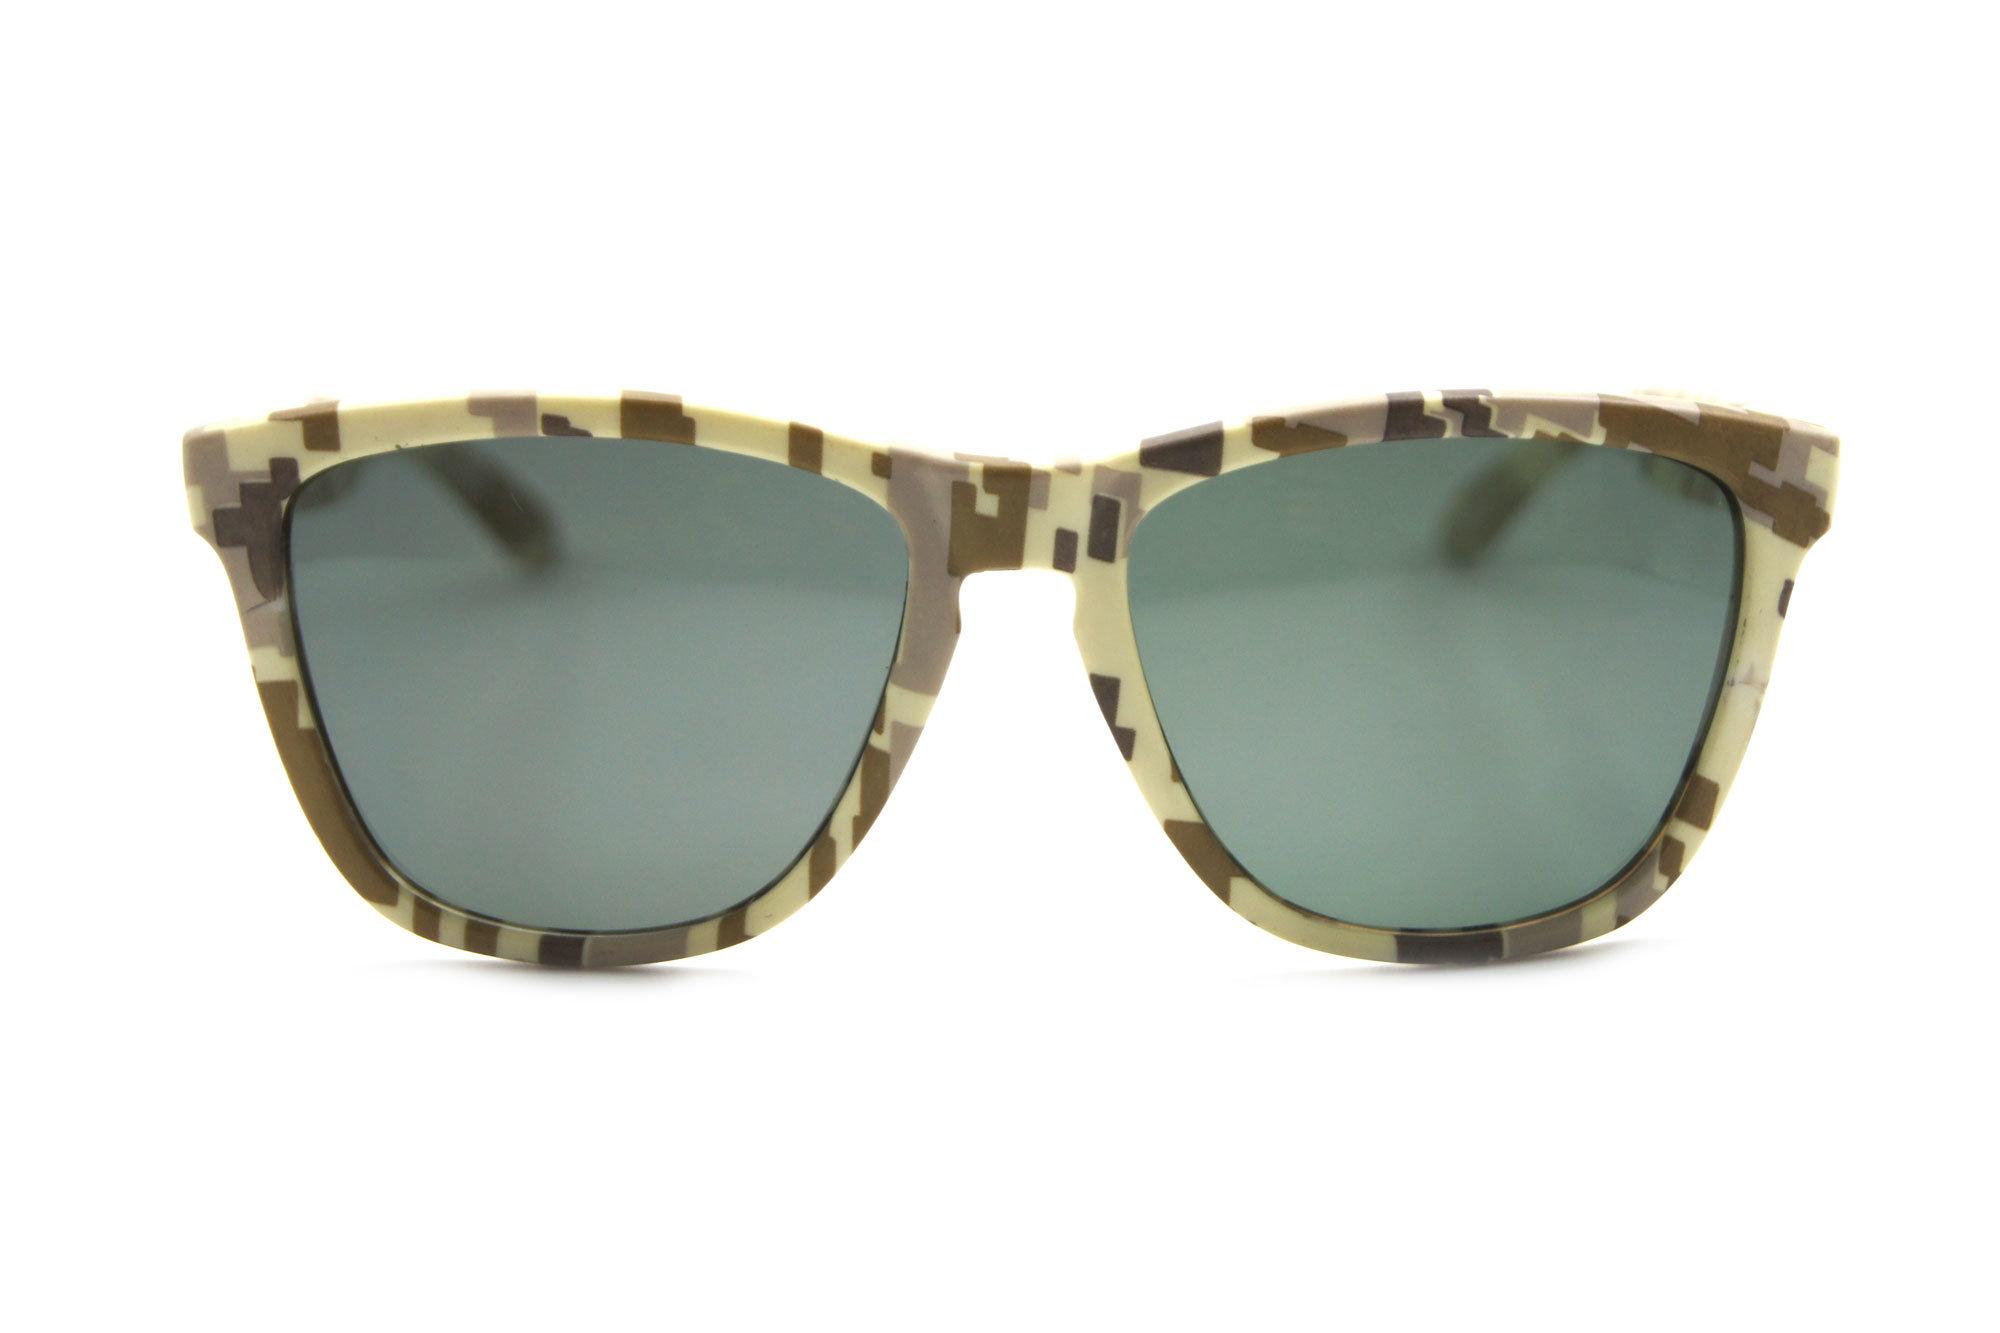 New Design Good Quality Camouflage Frame Fashion Sunglasses